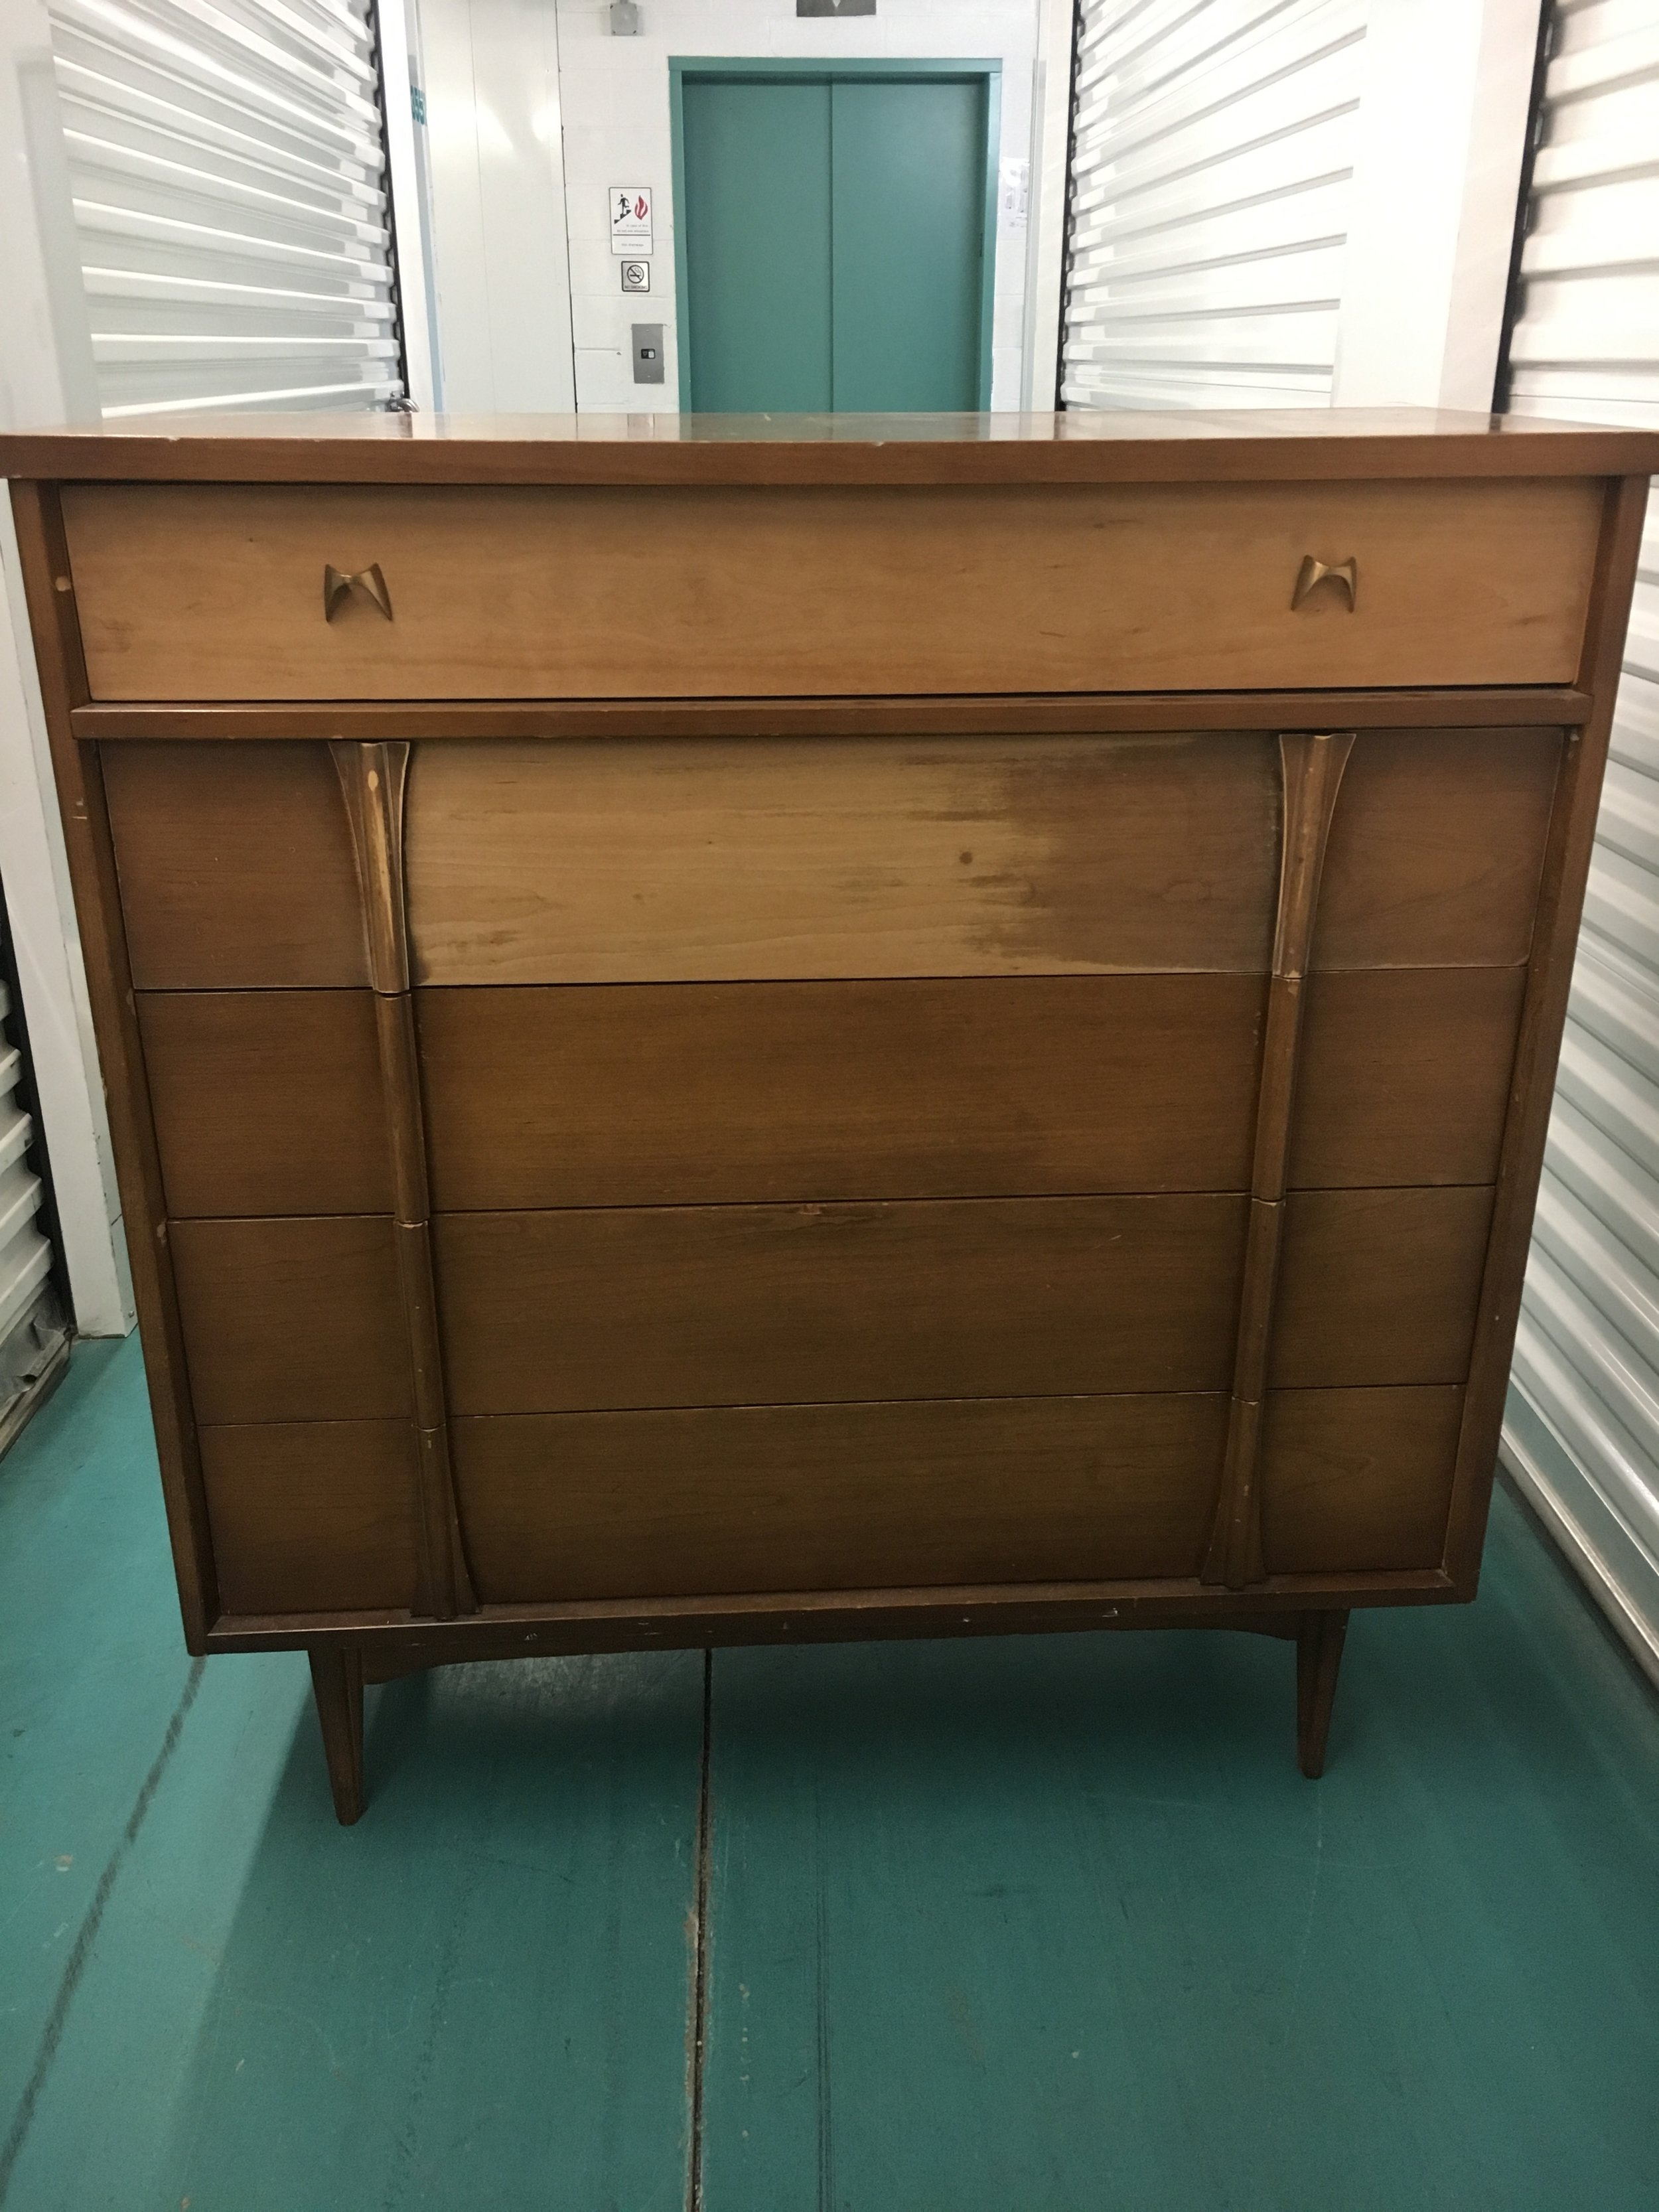 Bassett Furniture MidCentury Modern 5 Drawer Dresser